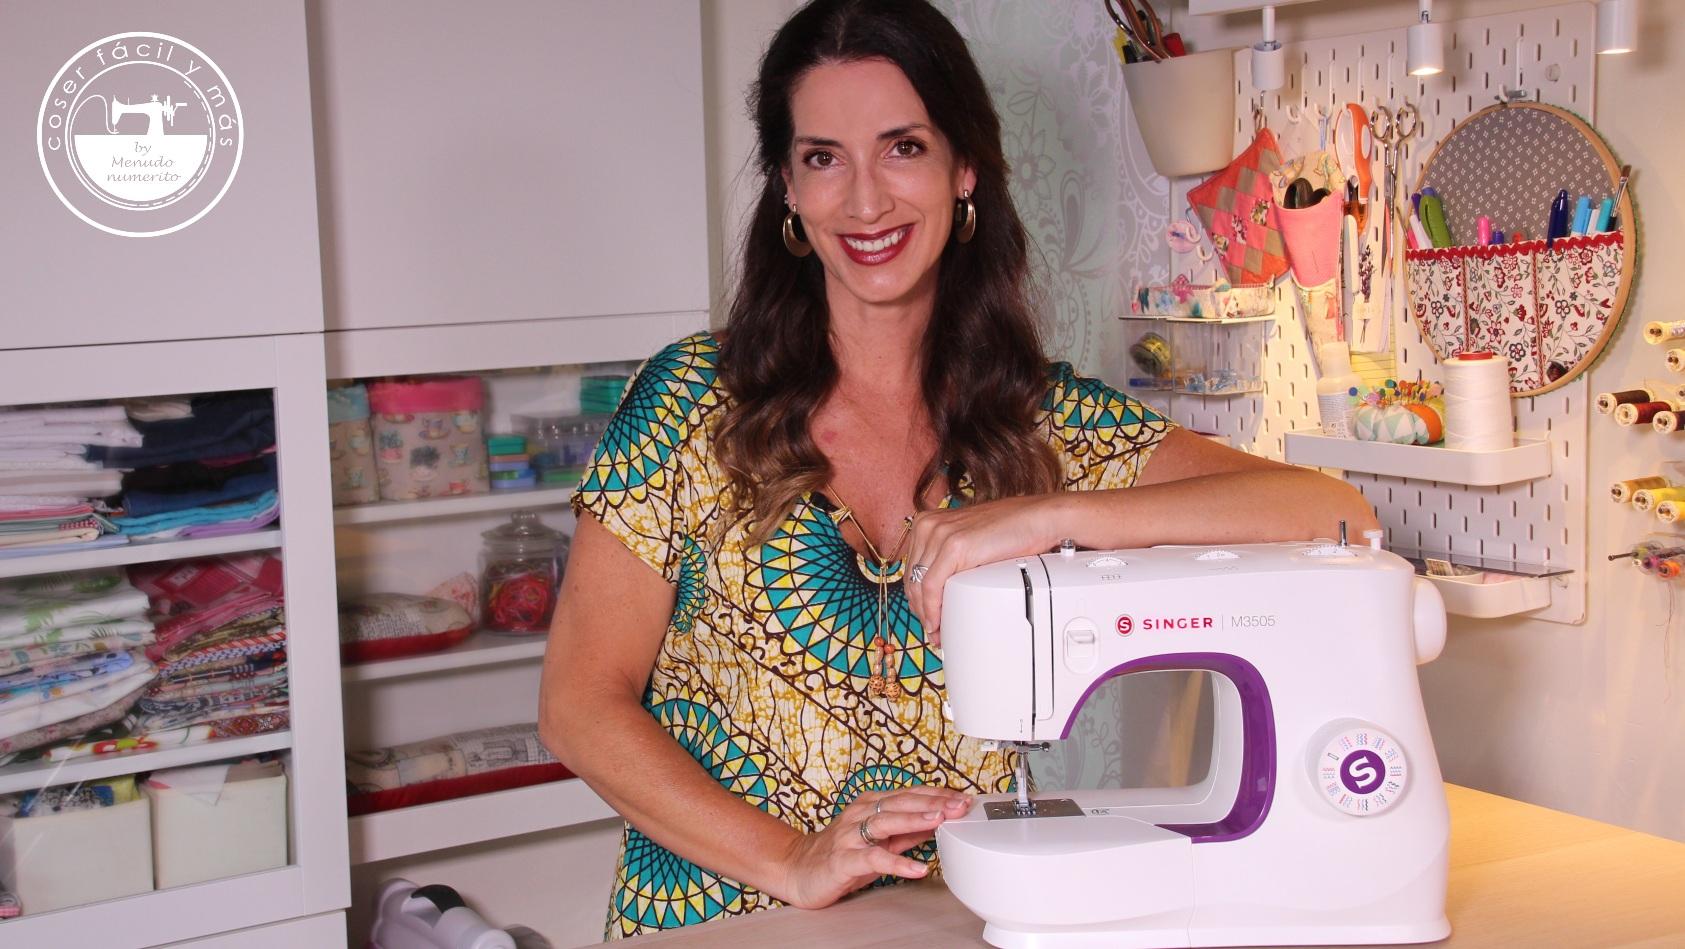 singer m3505 maquina de coser menudo numerito blogs de costura